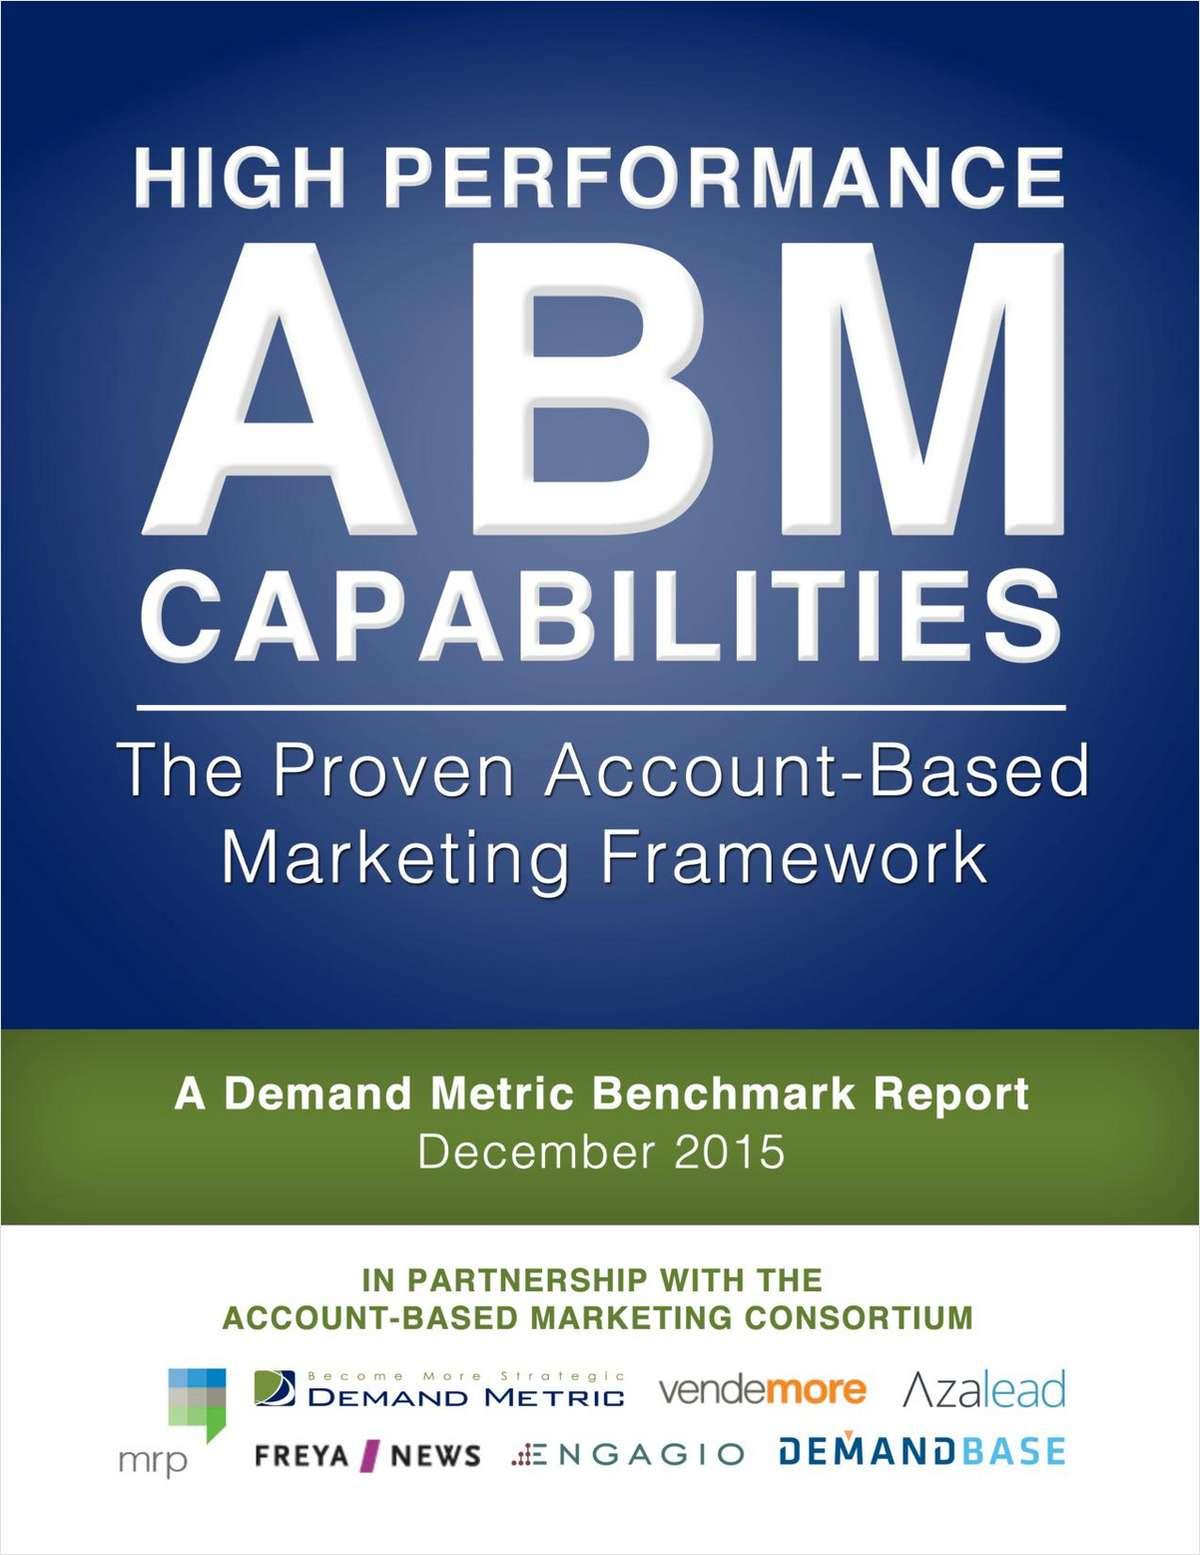 High Performance ABM Capabilities: The Proven Account-Based Marketing Framework